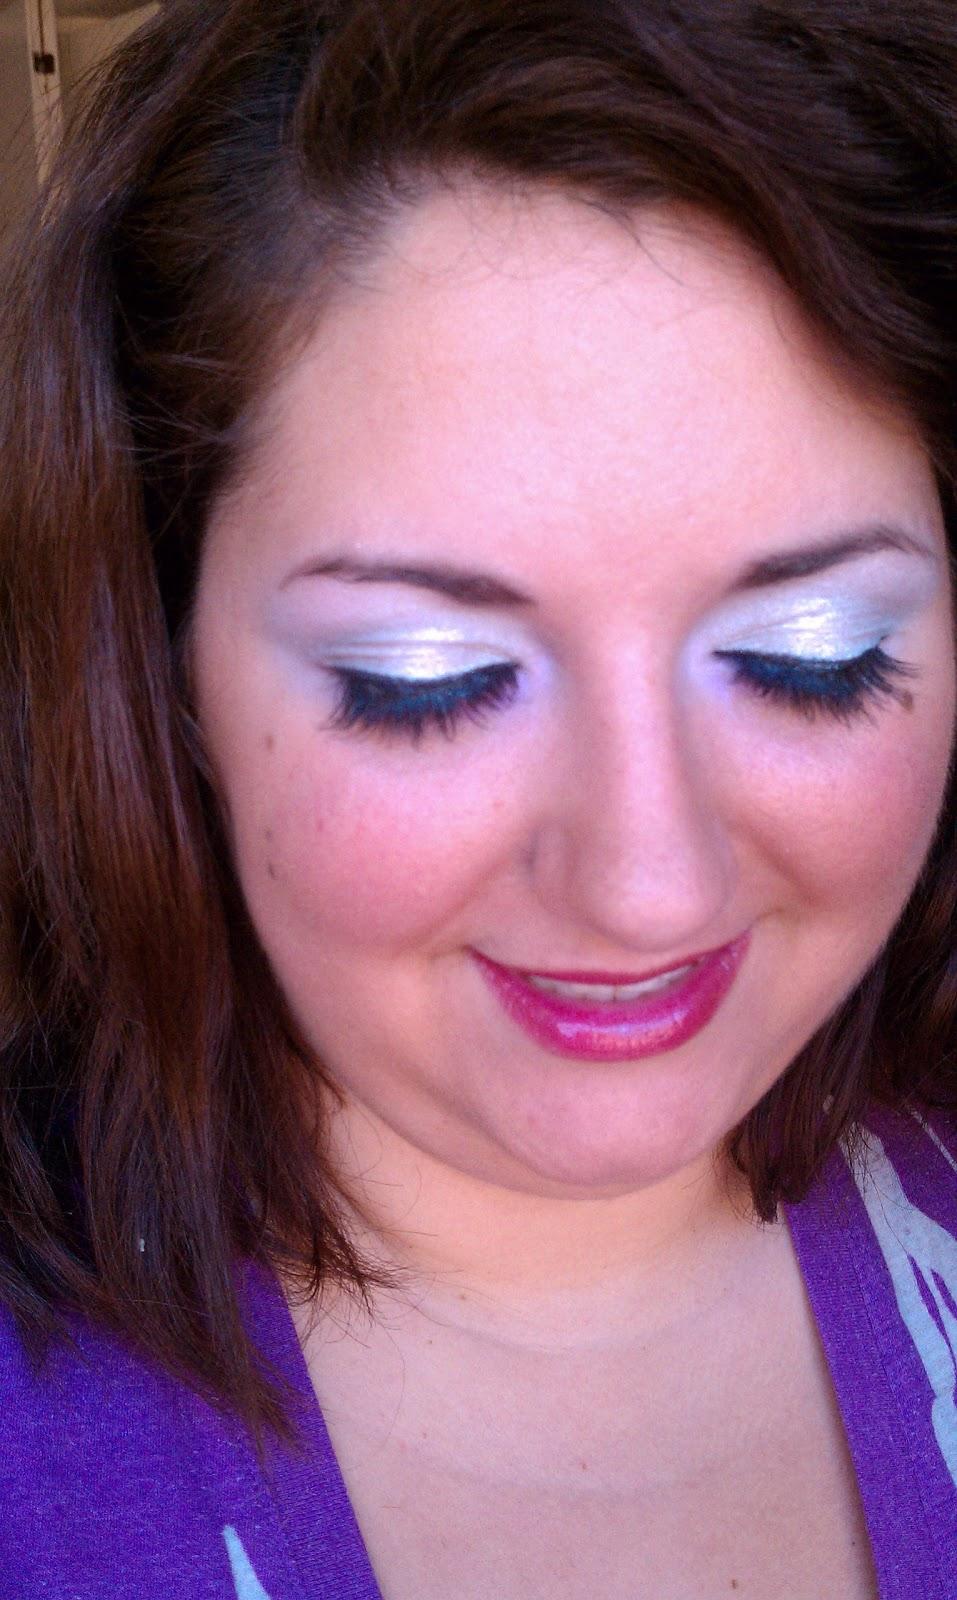 retrourbanrainbow: halloween 2010: classic angel makeup